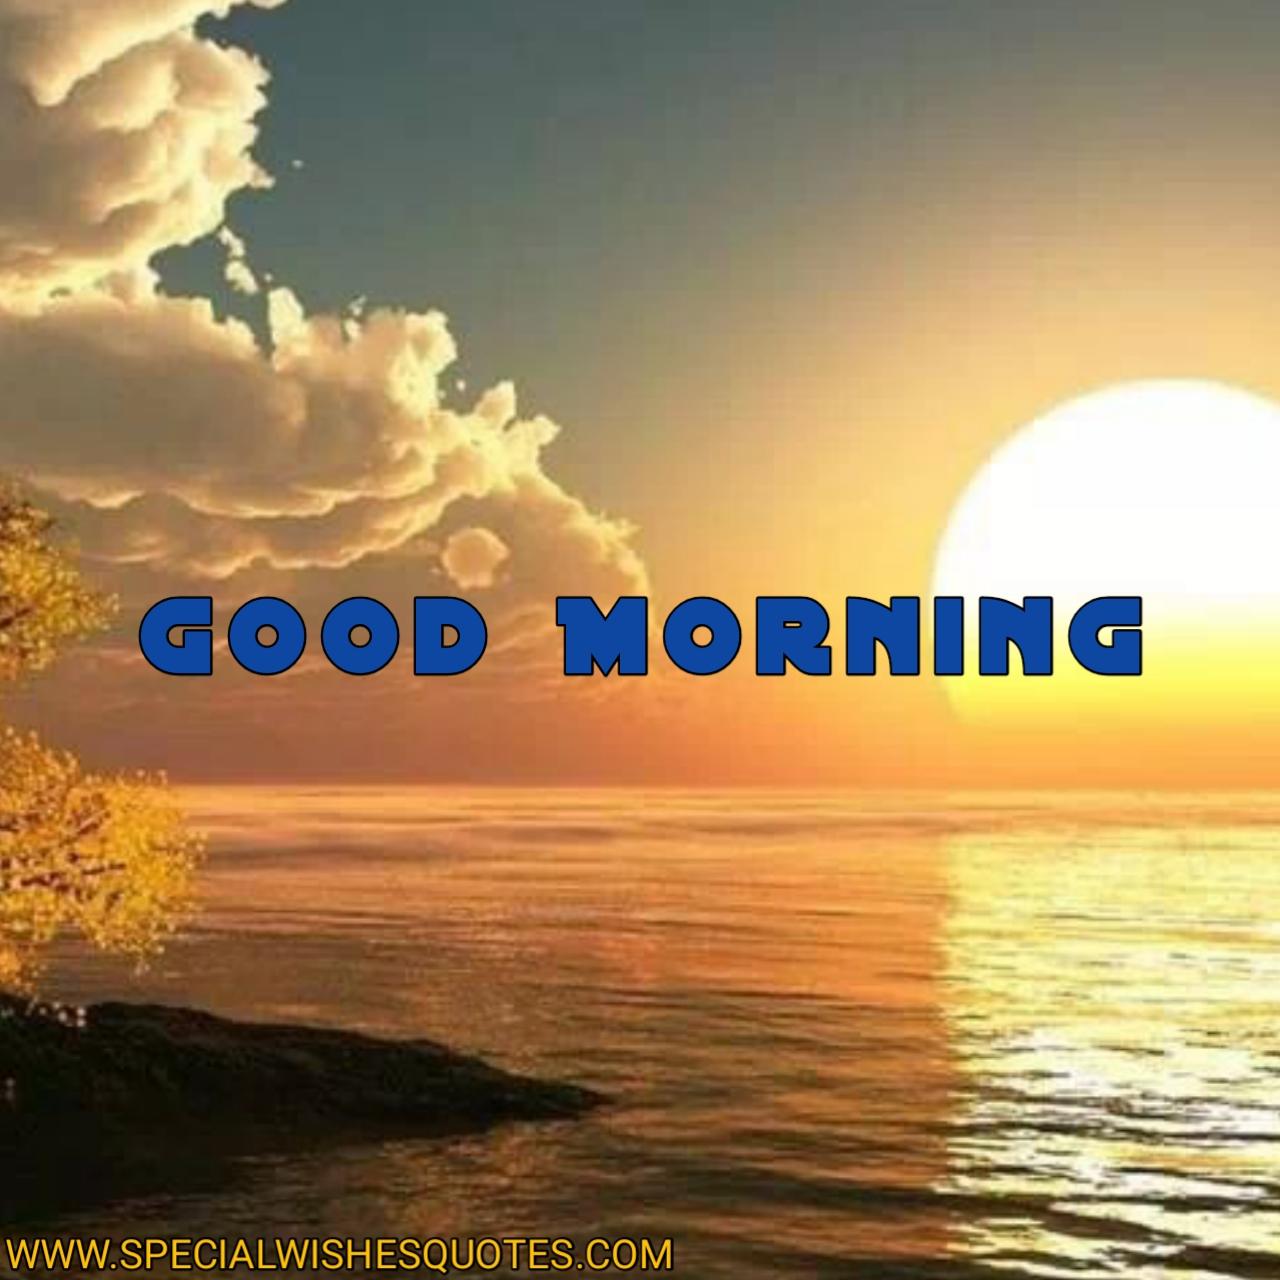 good morning image hd